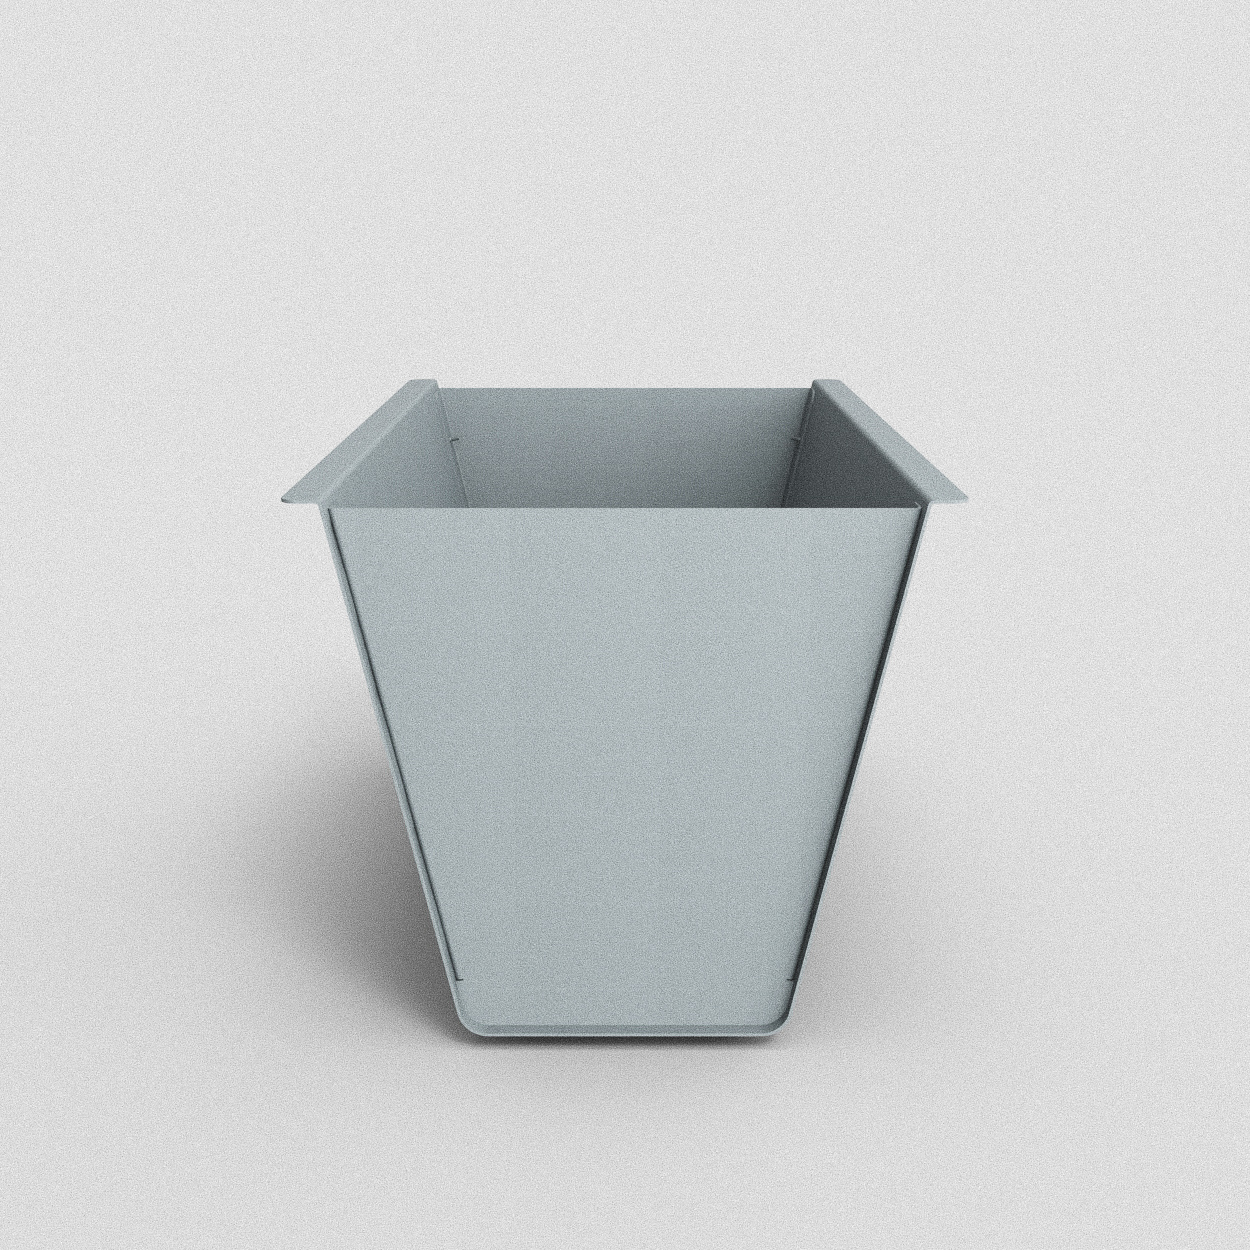 300L / Standardfärg: Granit